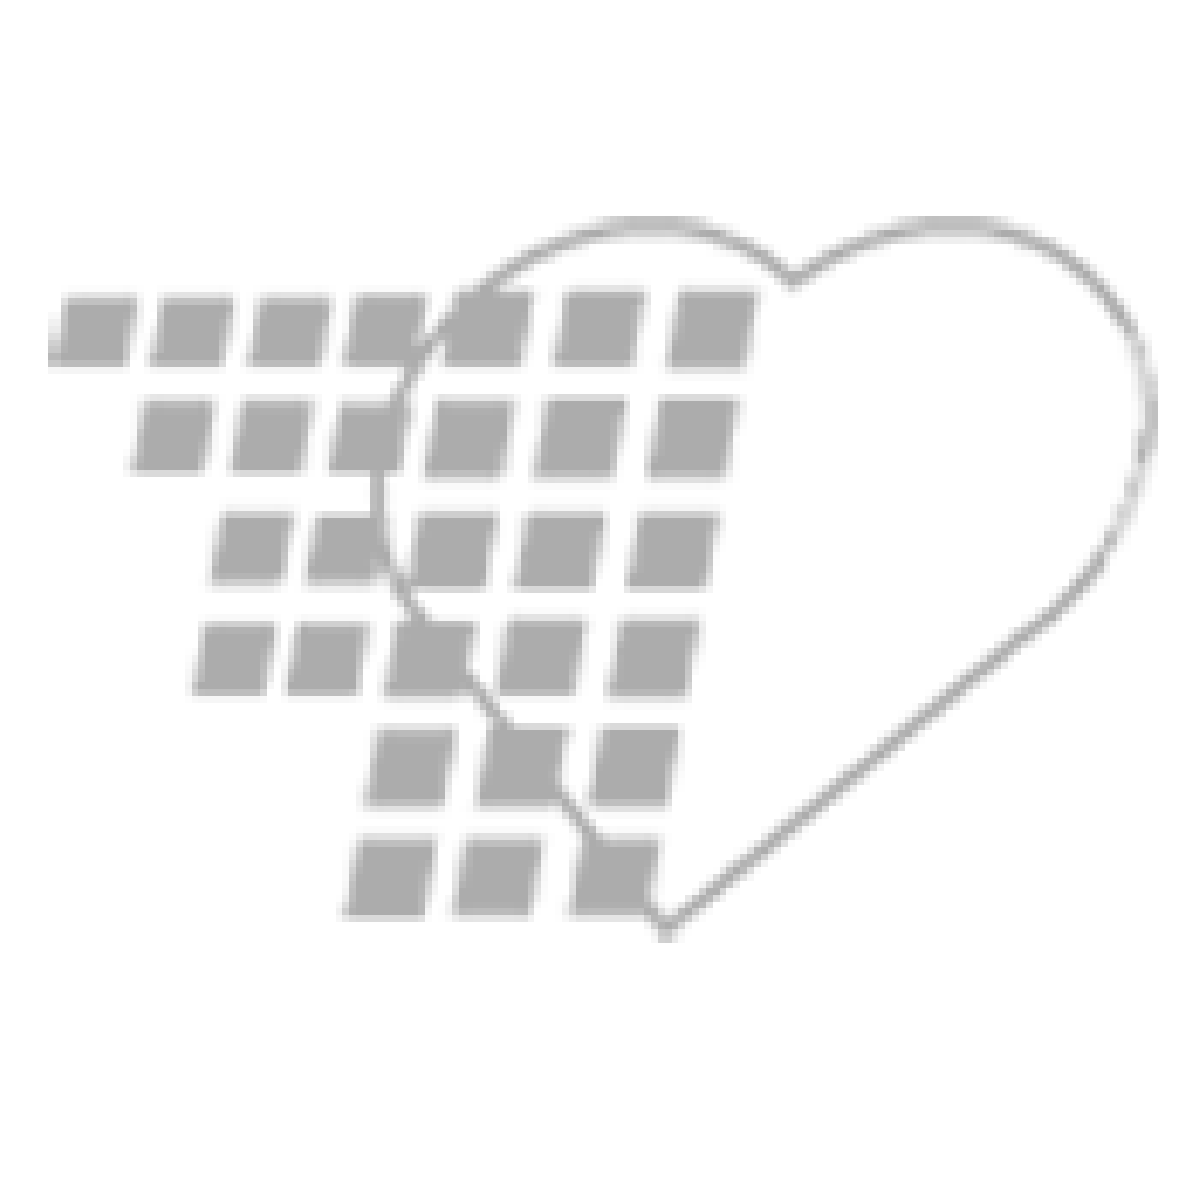 02-92-1005-6IN - Baseline® Plastic Goniometer - 360 Degree Head - 6 Inch Arm